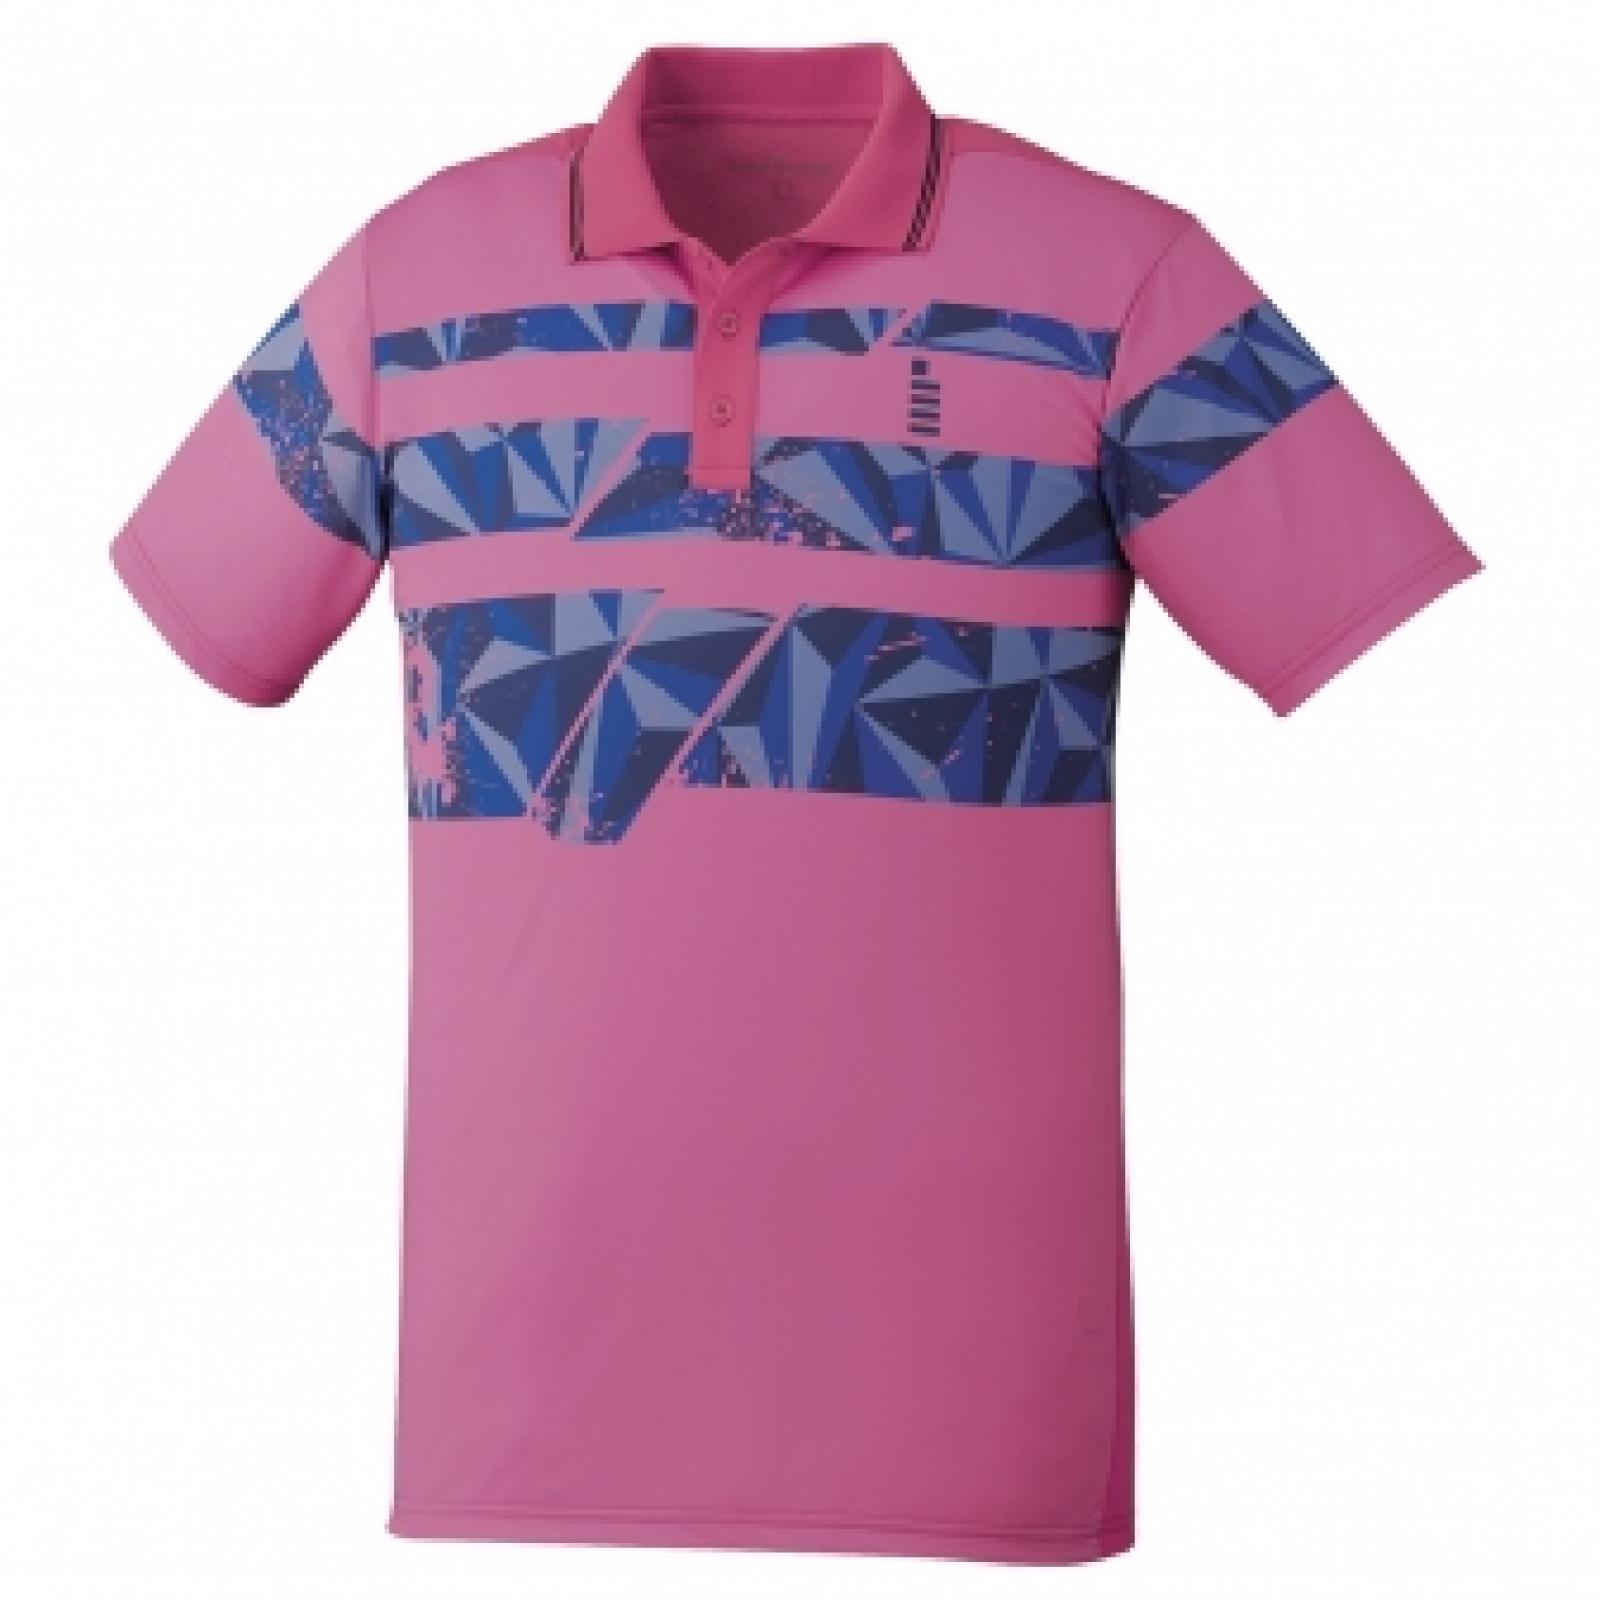 https://www.badec.store/produkty_img/badmintonove-tricko1570119506L.jpg